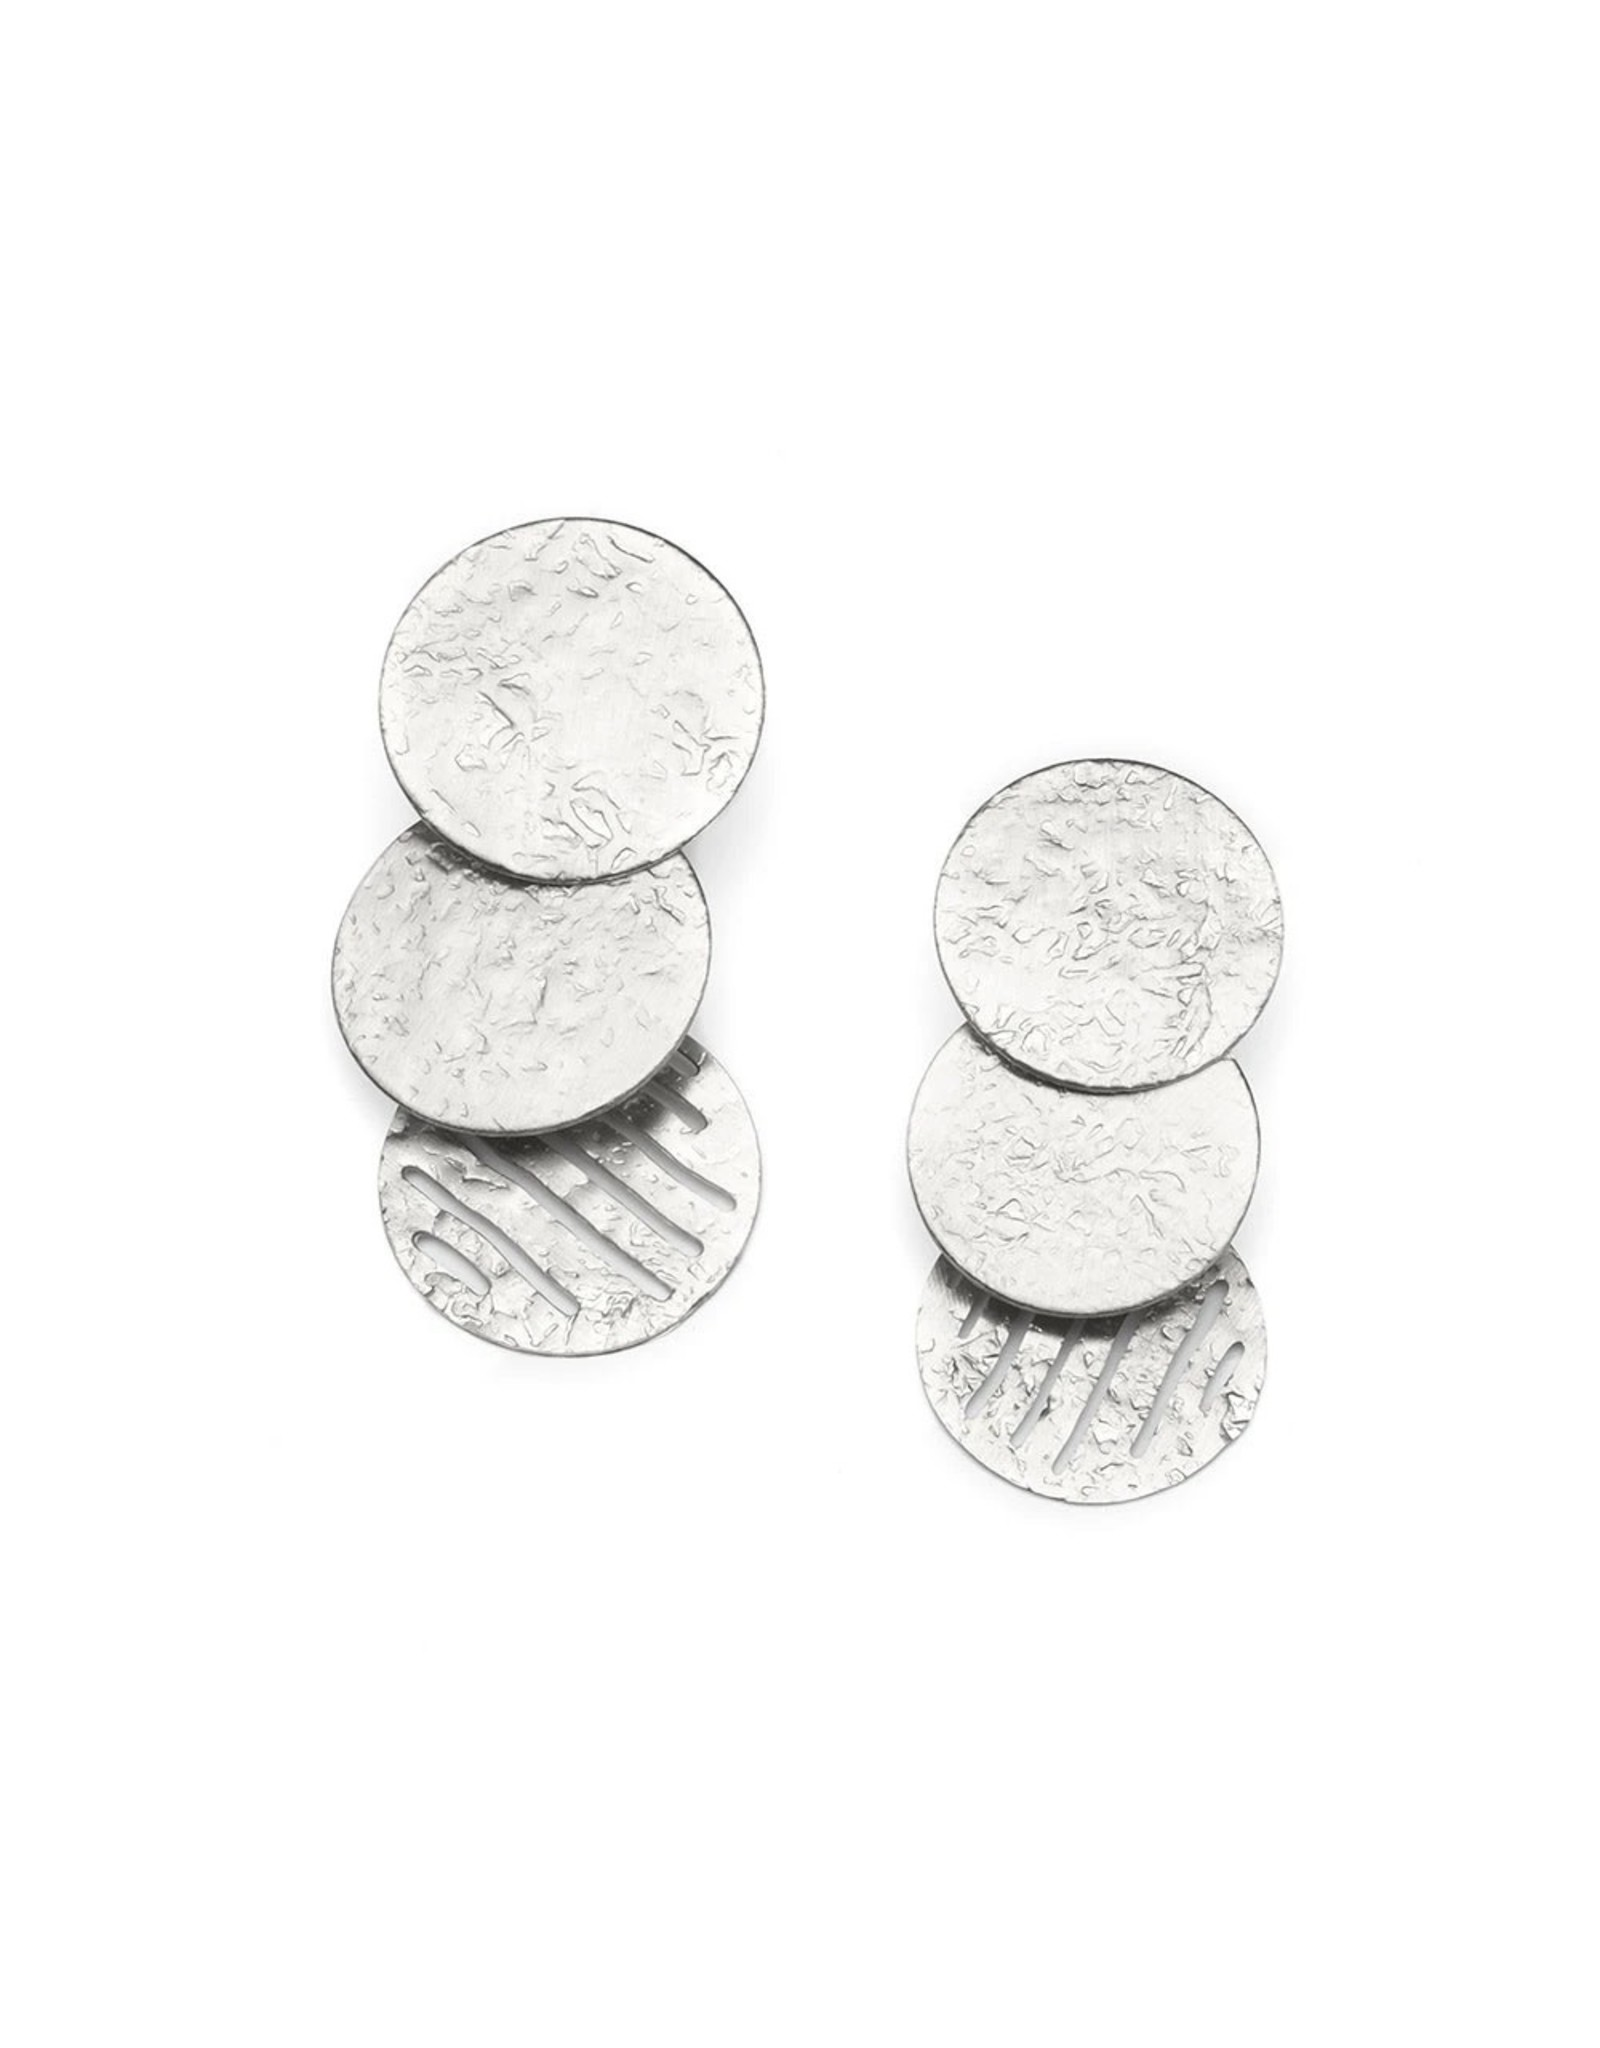 Matr Boomie Nihira Silver Coin Earrings, India